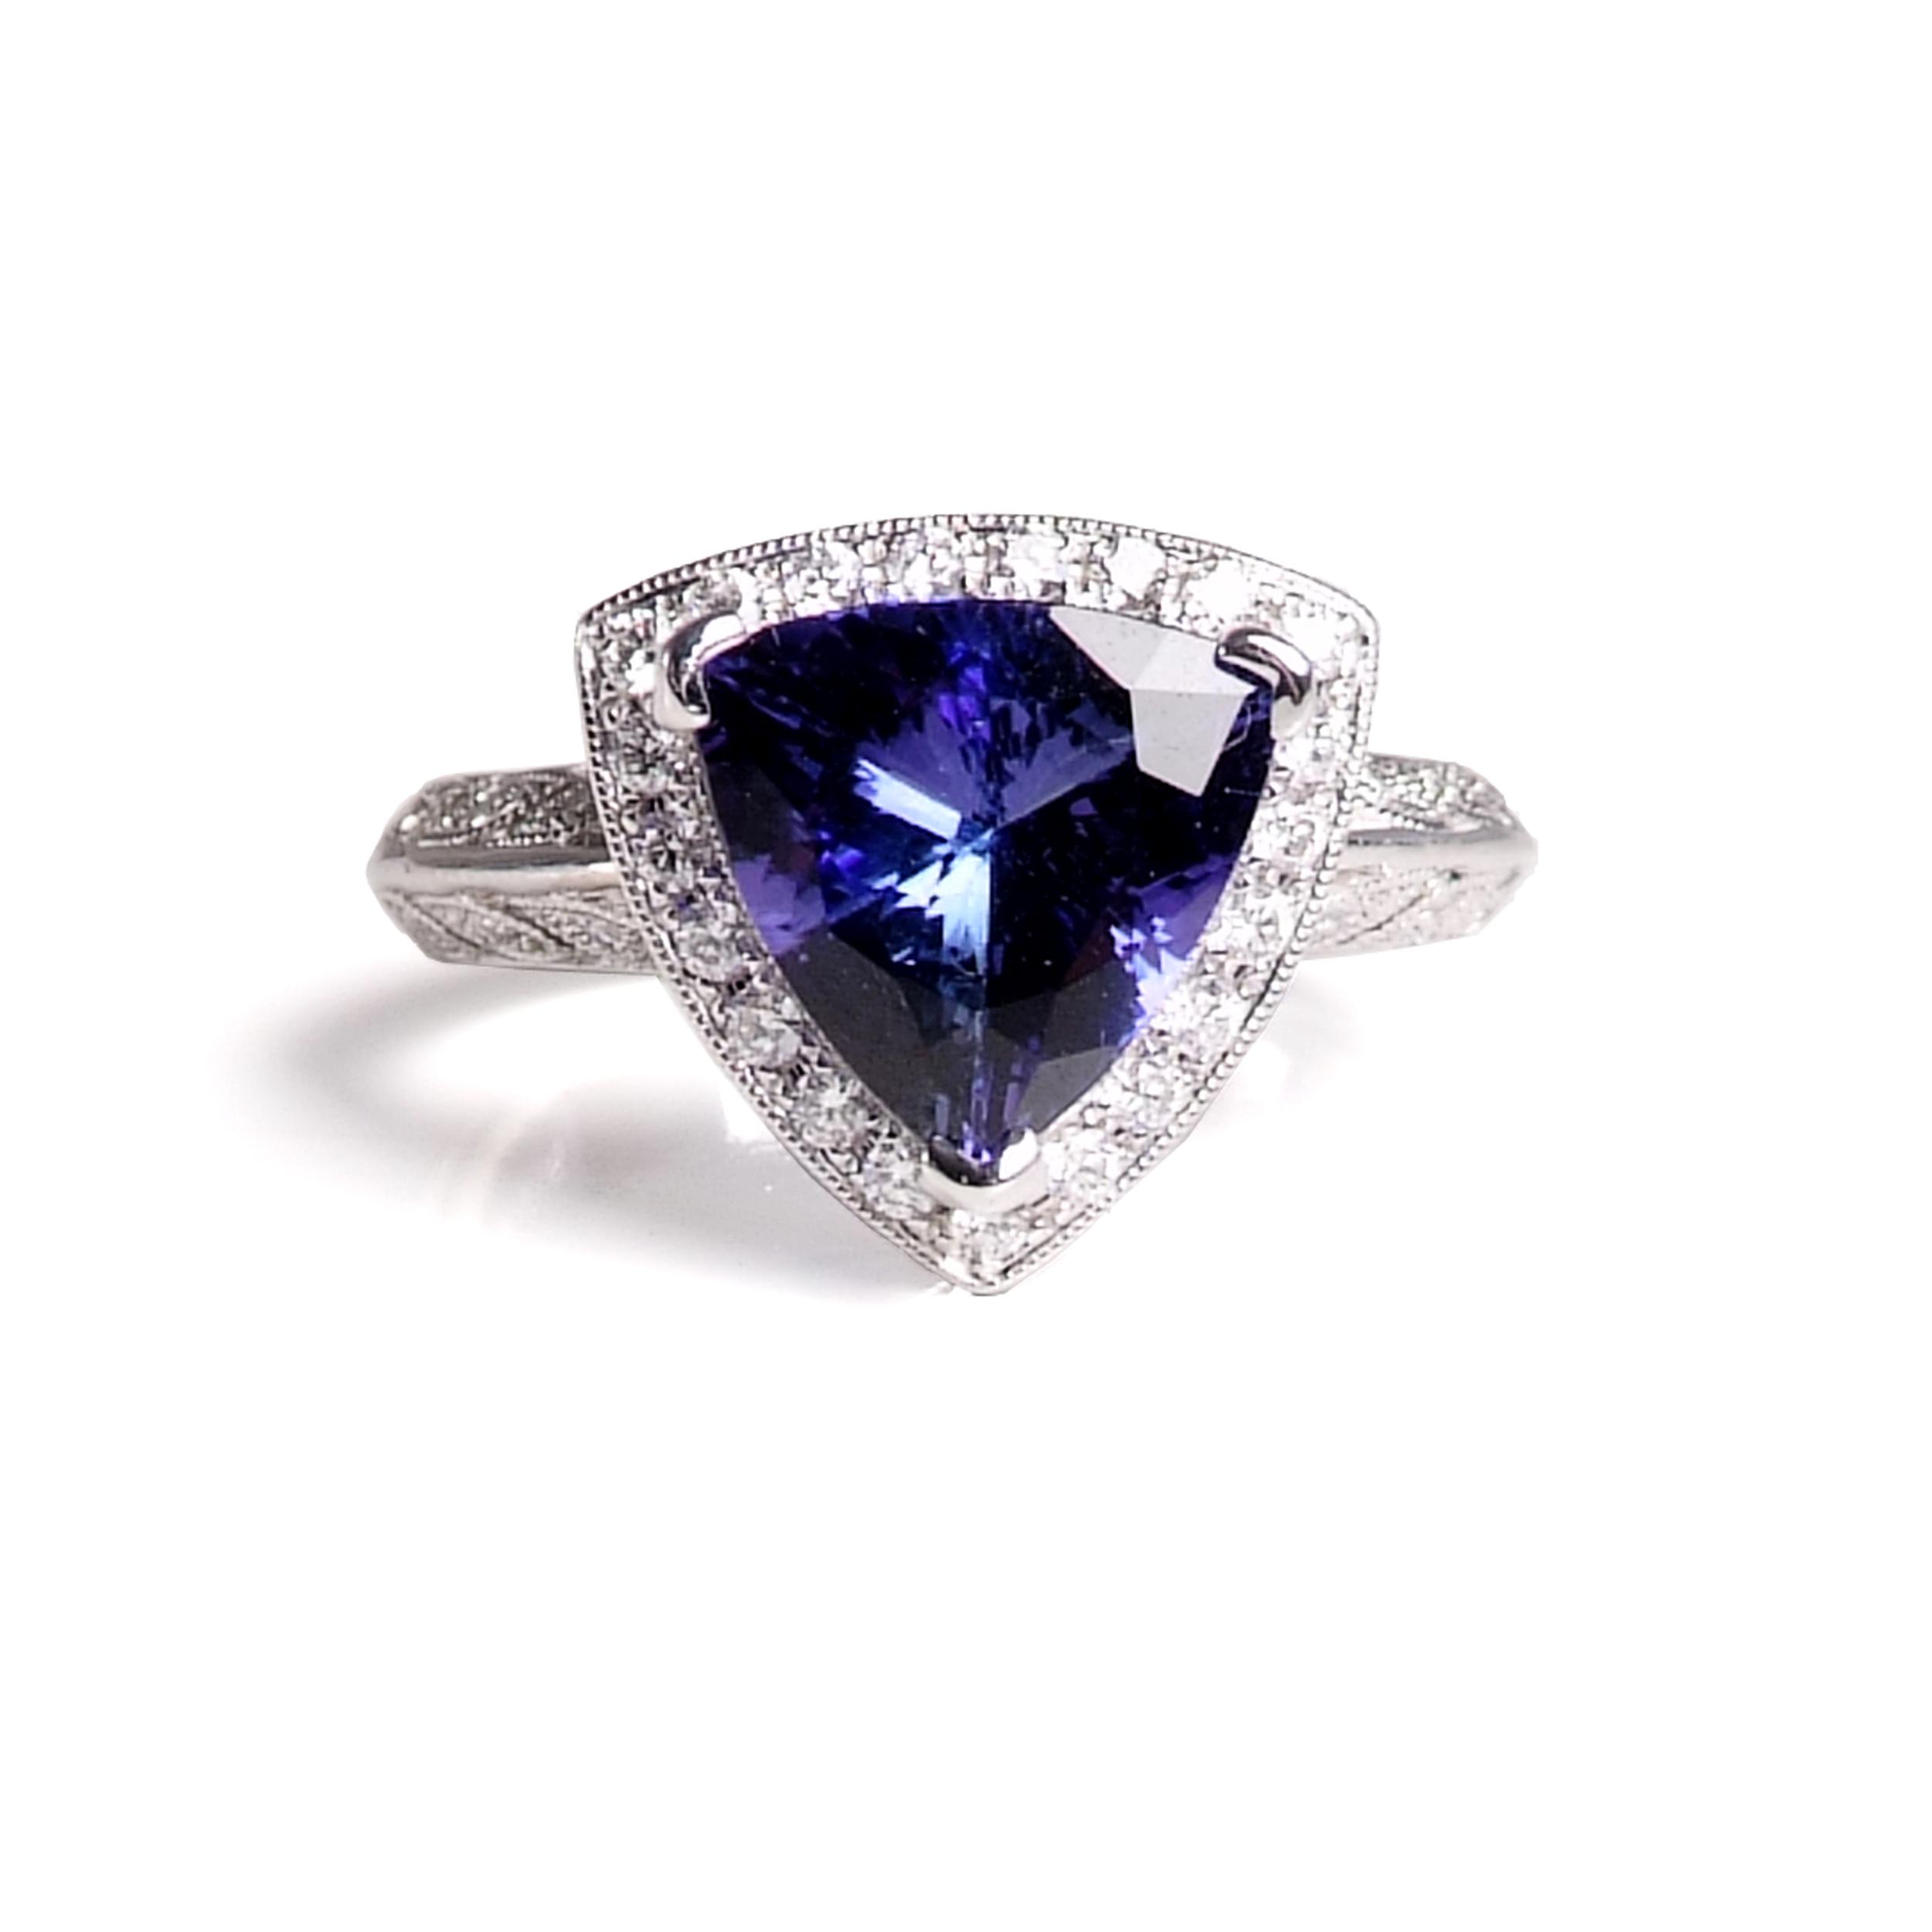 Craft-Revival Jewelers, tanzanite ring, antique ring, halo ring, gemstone halo ring